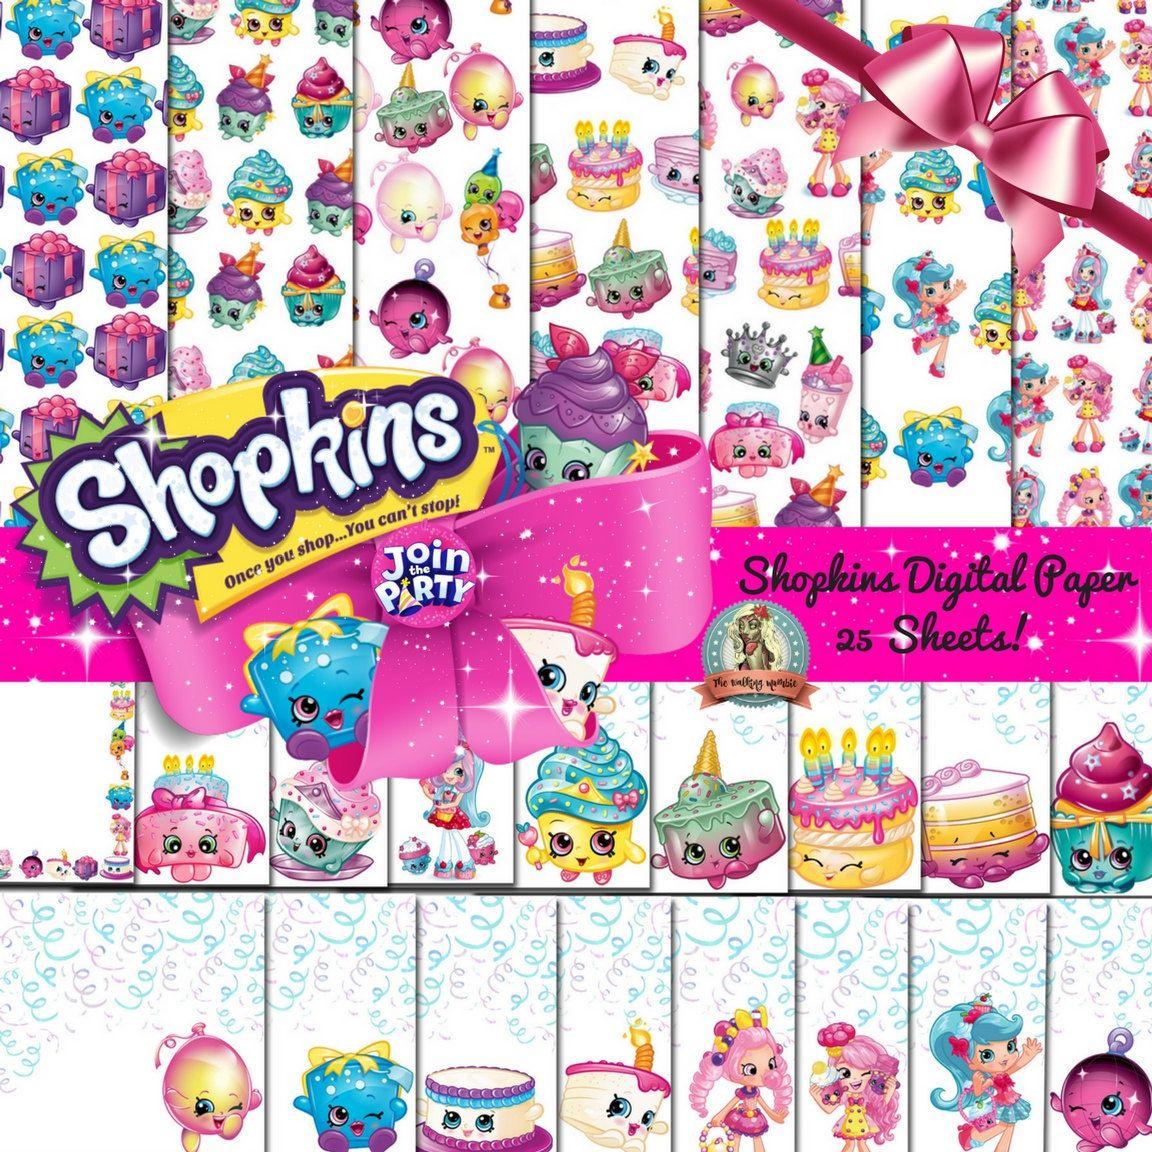 Scrapbook paper etsy - Shopkins Digital Paper Pack 25 Sheets 12 X12 Printable Paper Digital Scrapbook